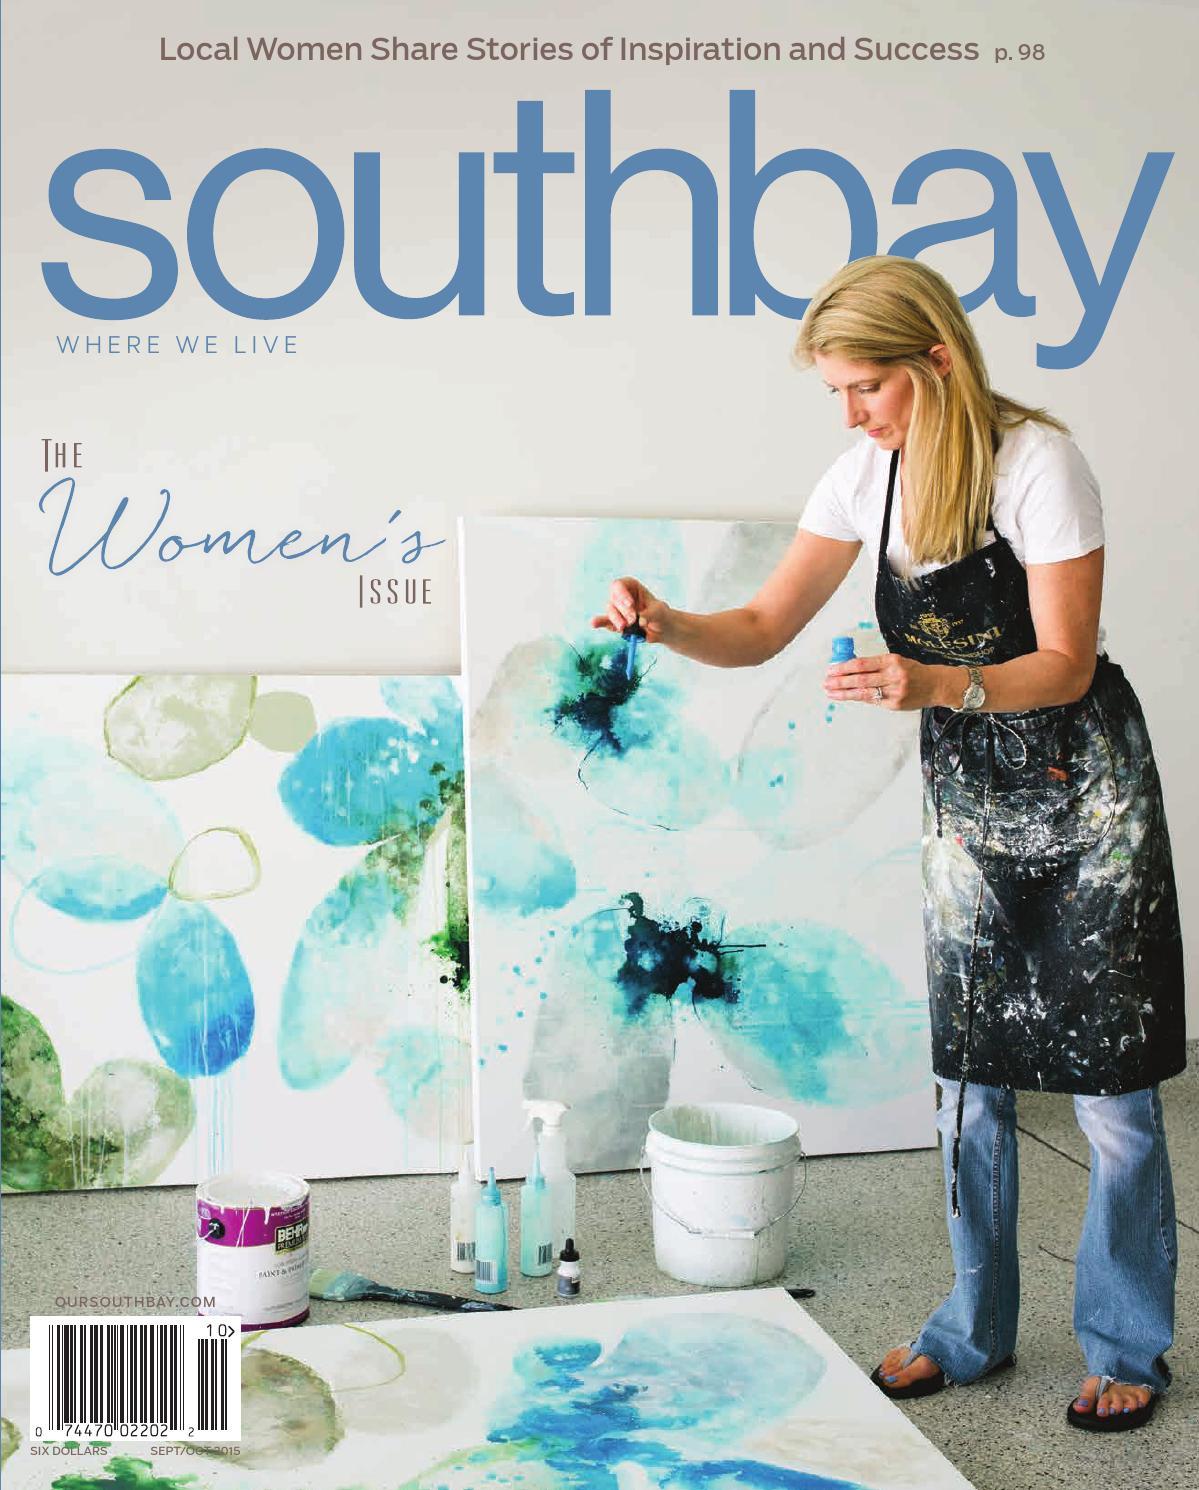 southbay magazine september october 2015 by moon tide media issuu. Black Bedroom Furniture Sets. Home Design Ideas